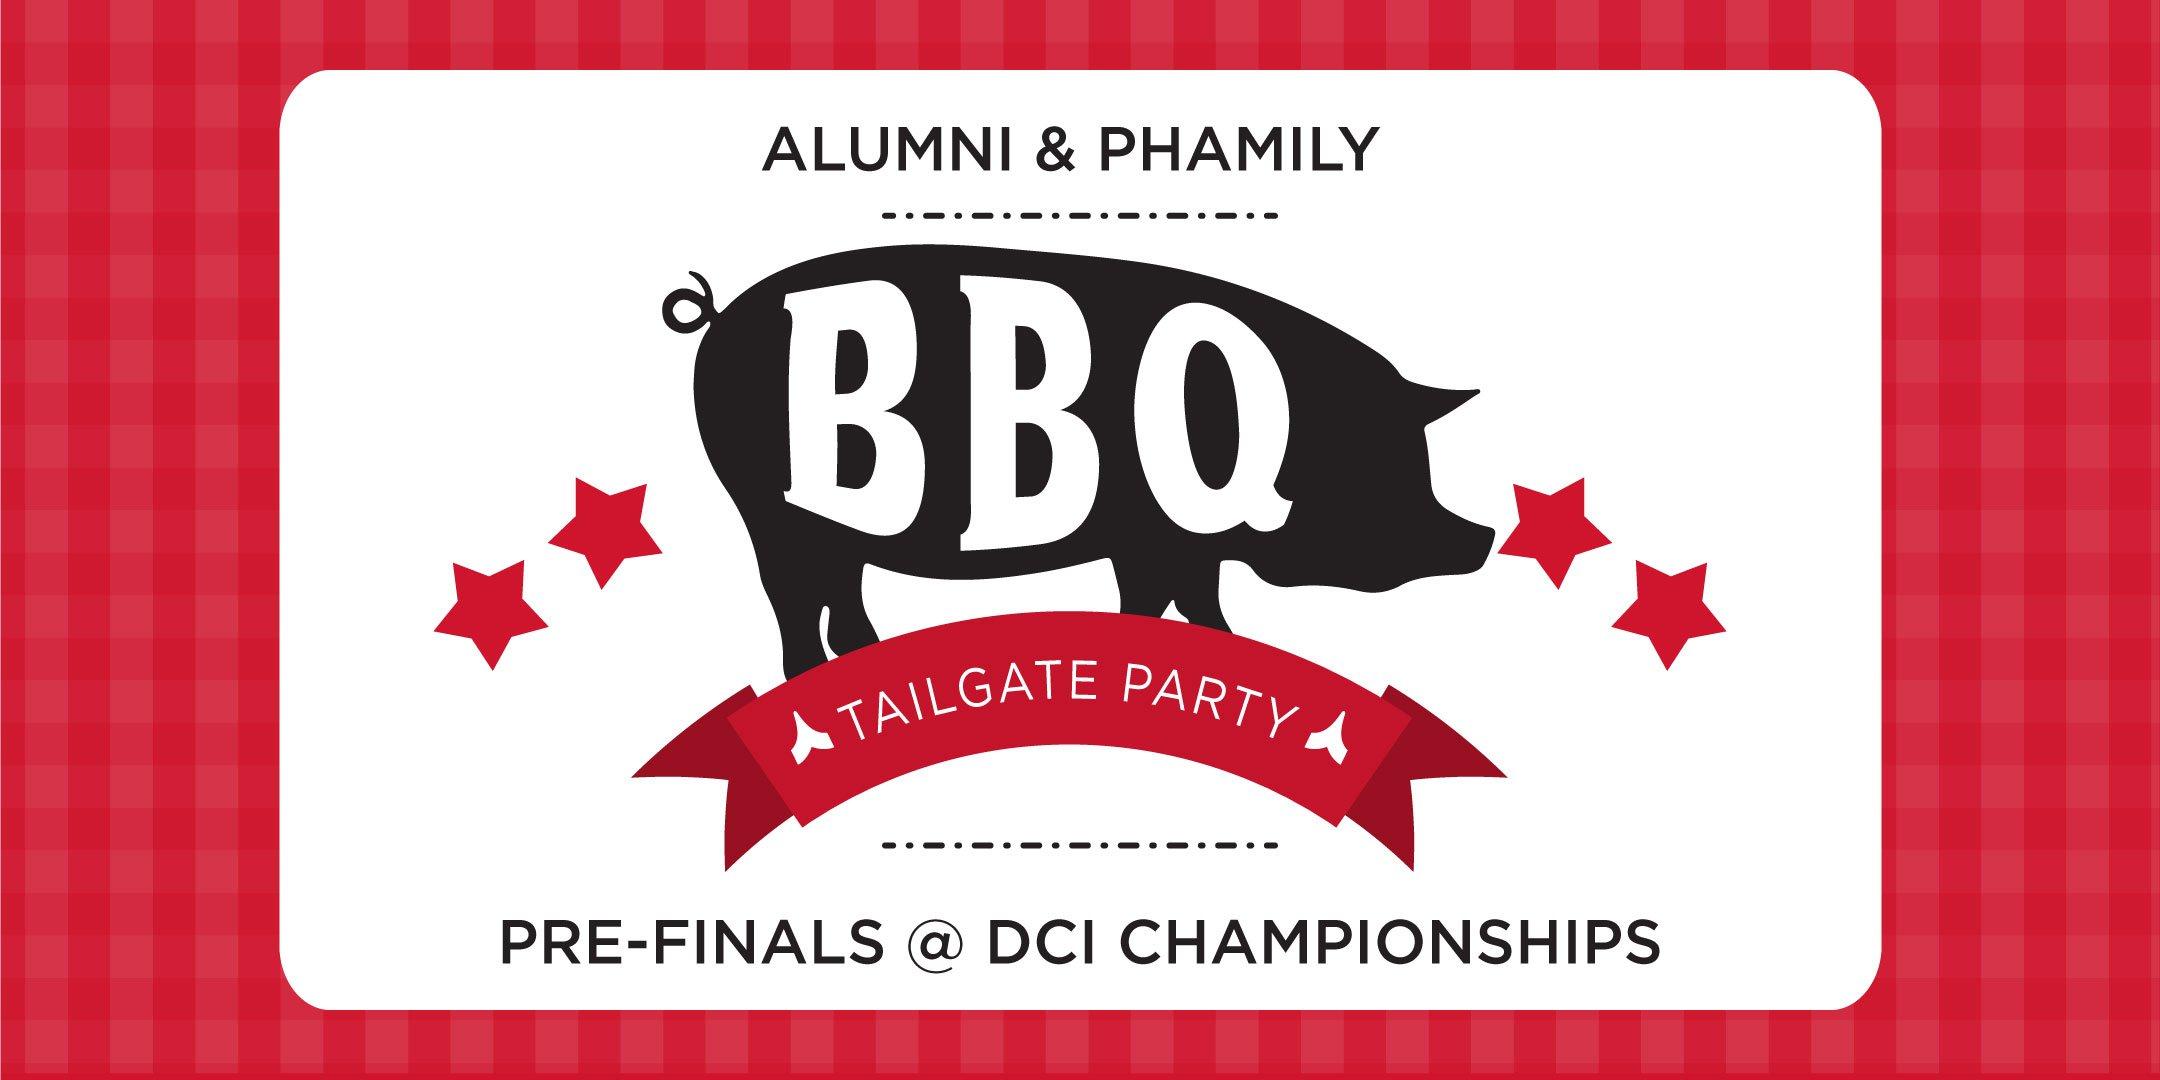 Pre-Finals Tailgate: Meal Ticket Deadline TONIGHT!